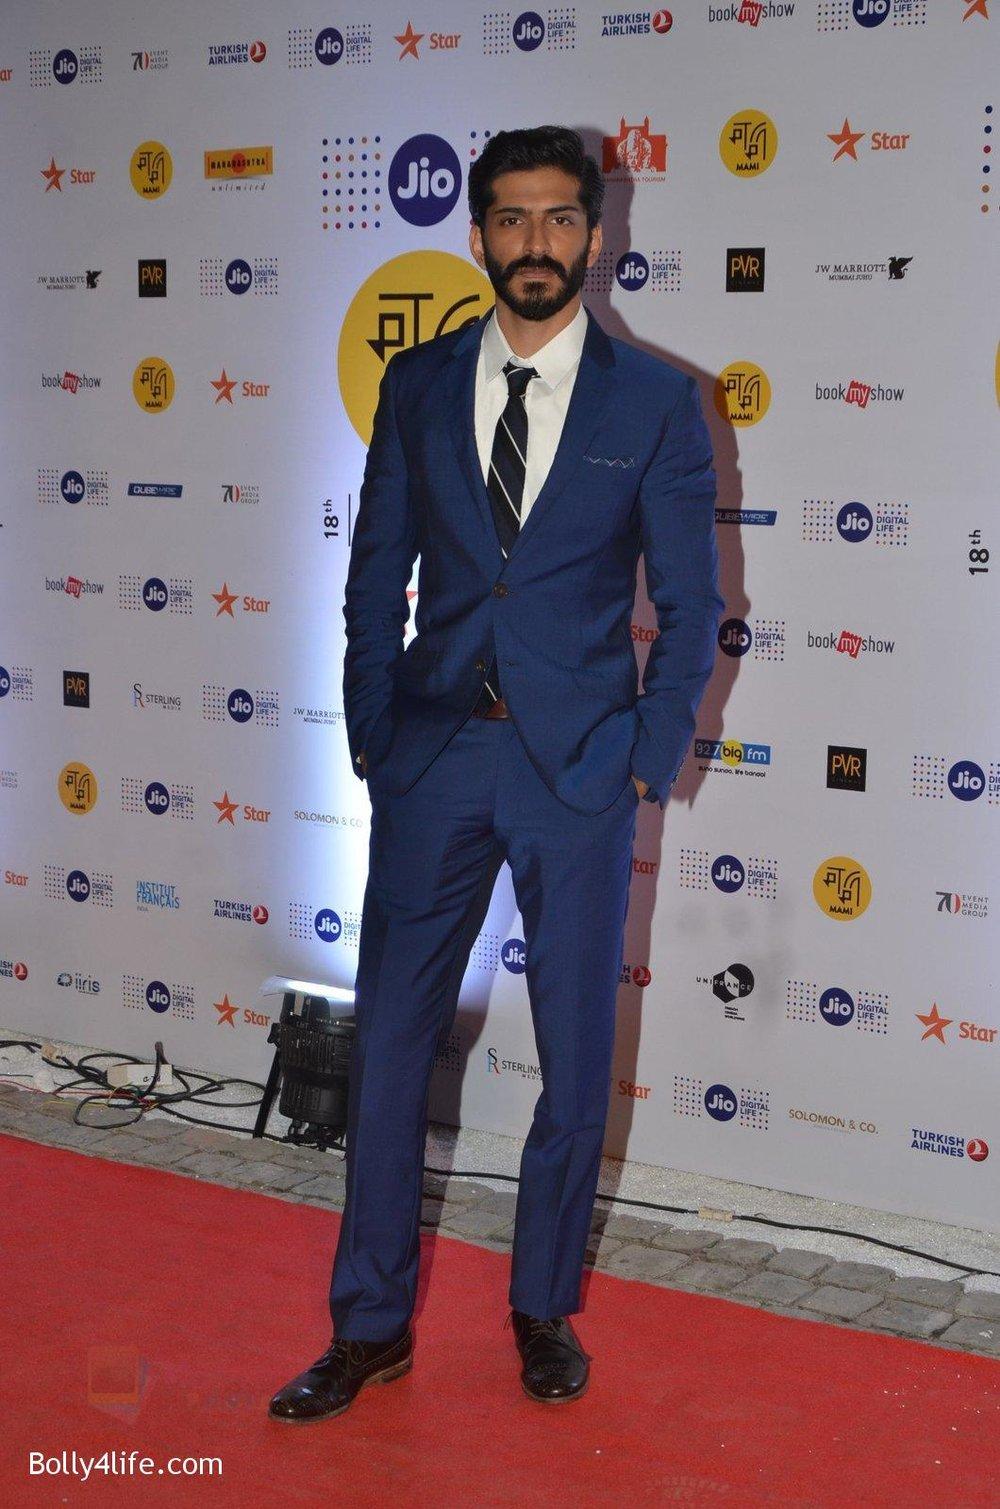 Harshvardhan-Kapoor-at-MAMI-Film-Festival-2016-on-20th-Oct-2016-308.jpg